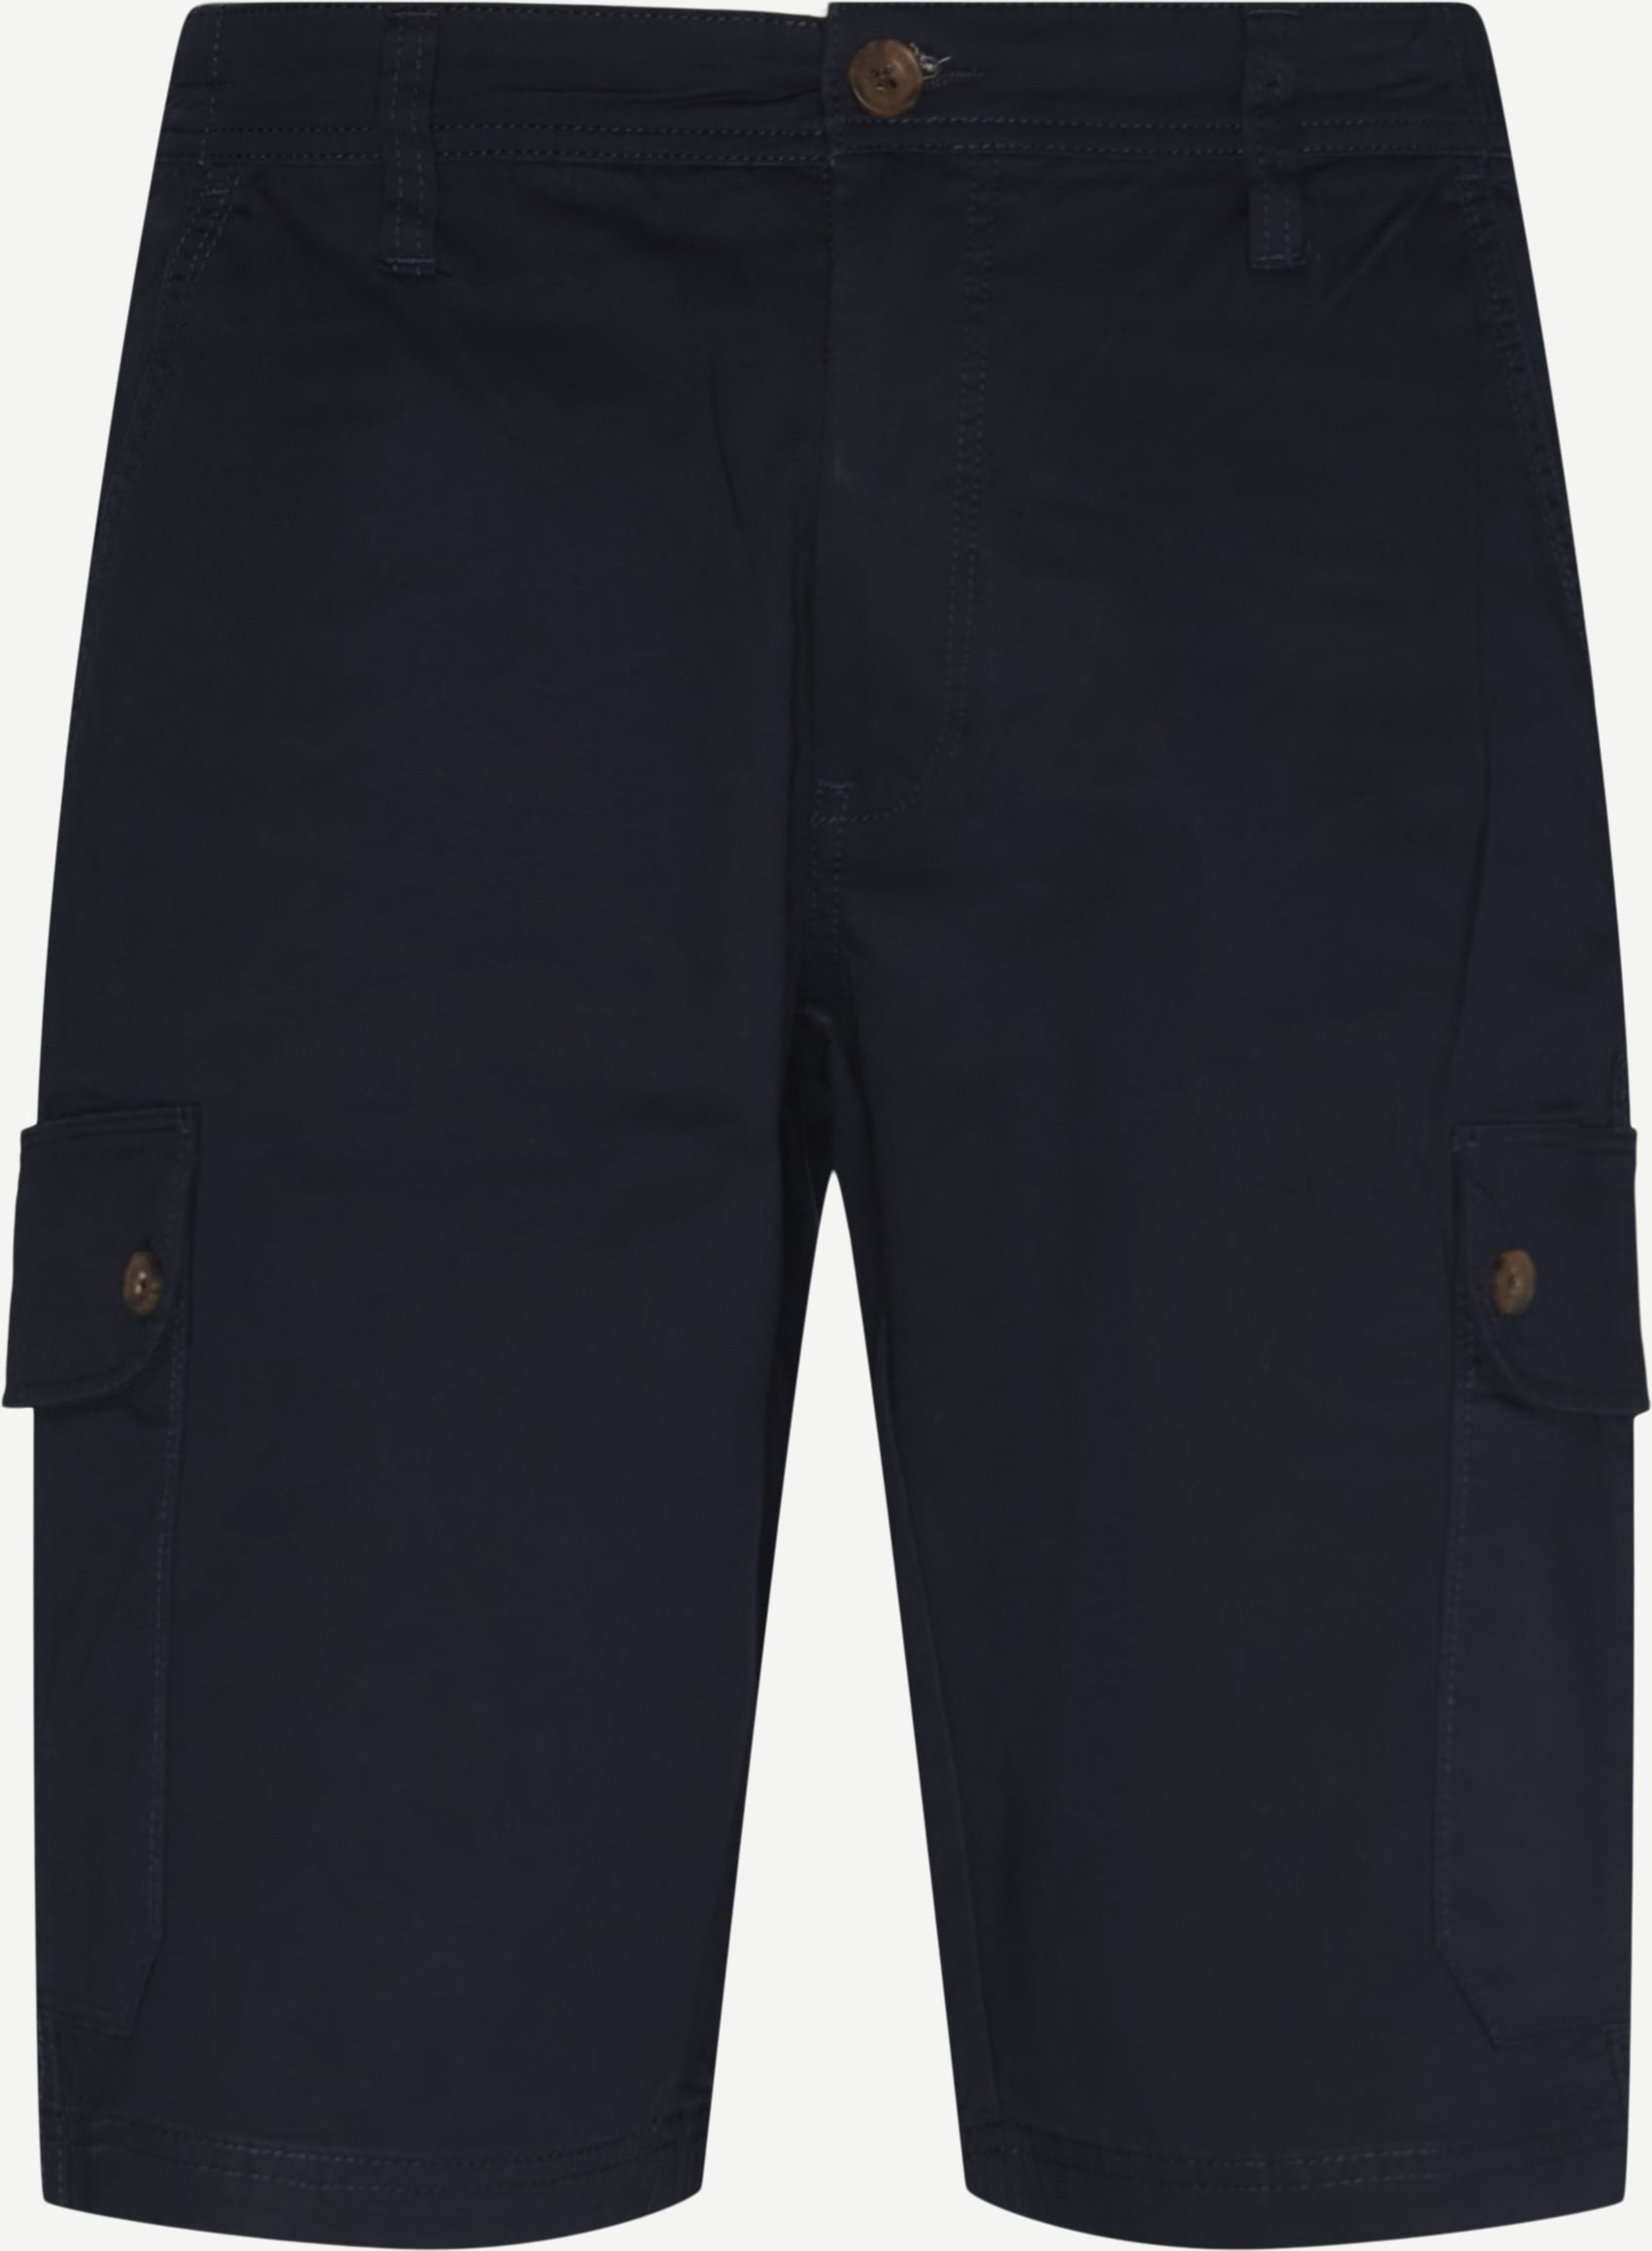 Shorts - Regular - Blau